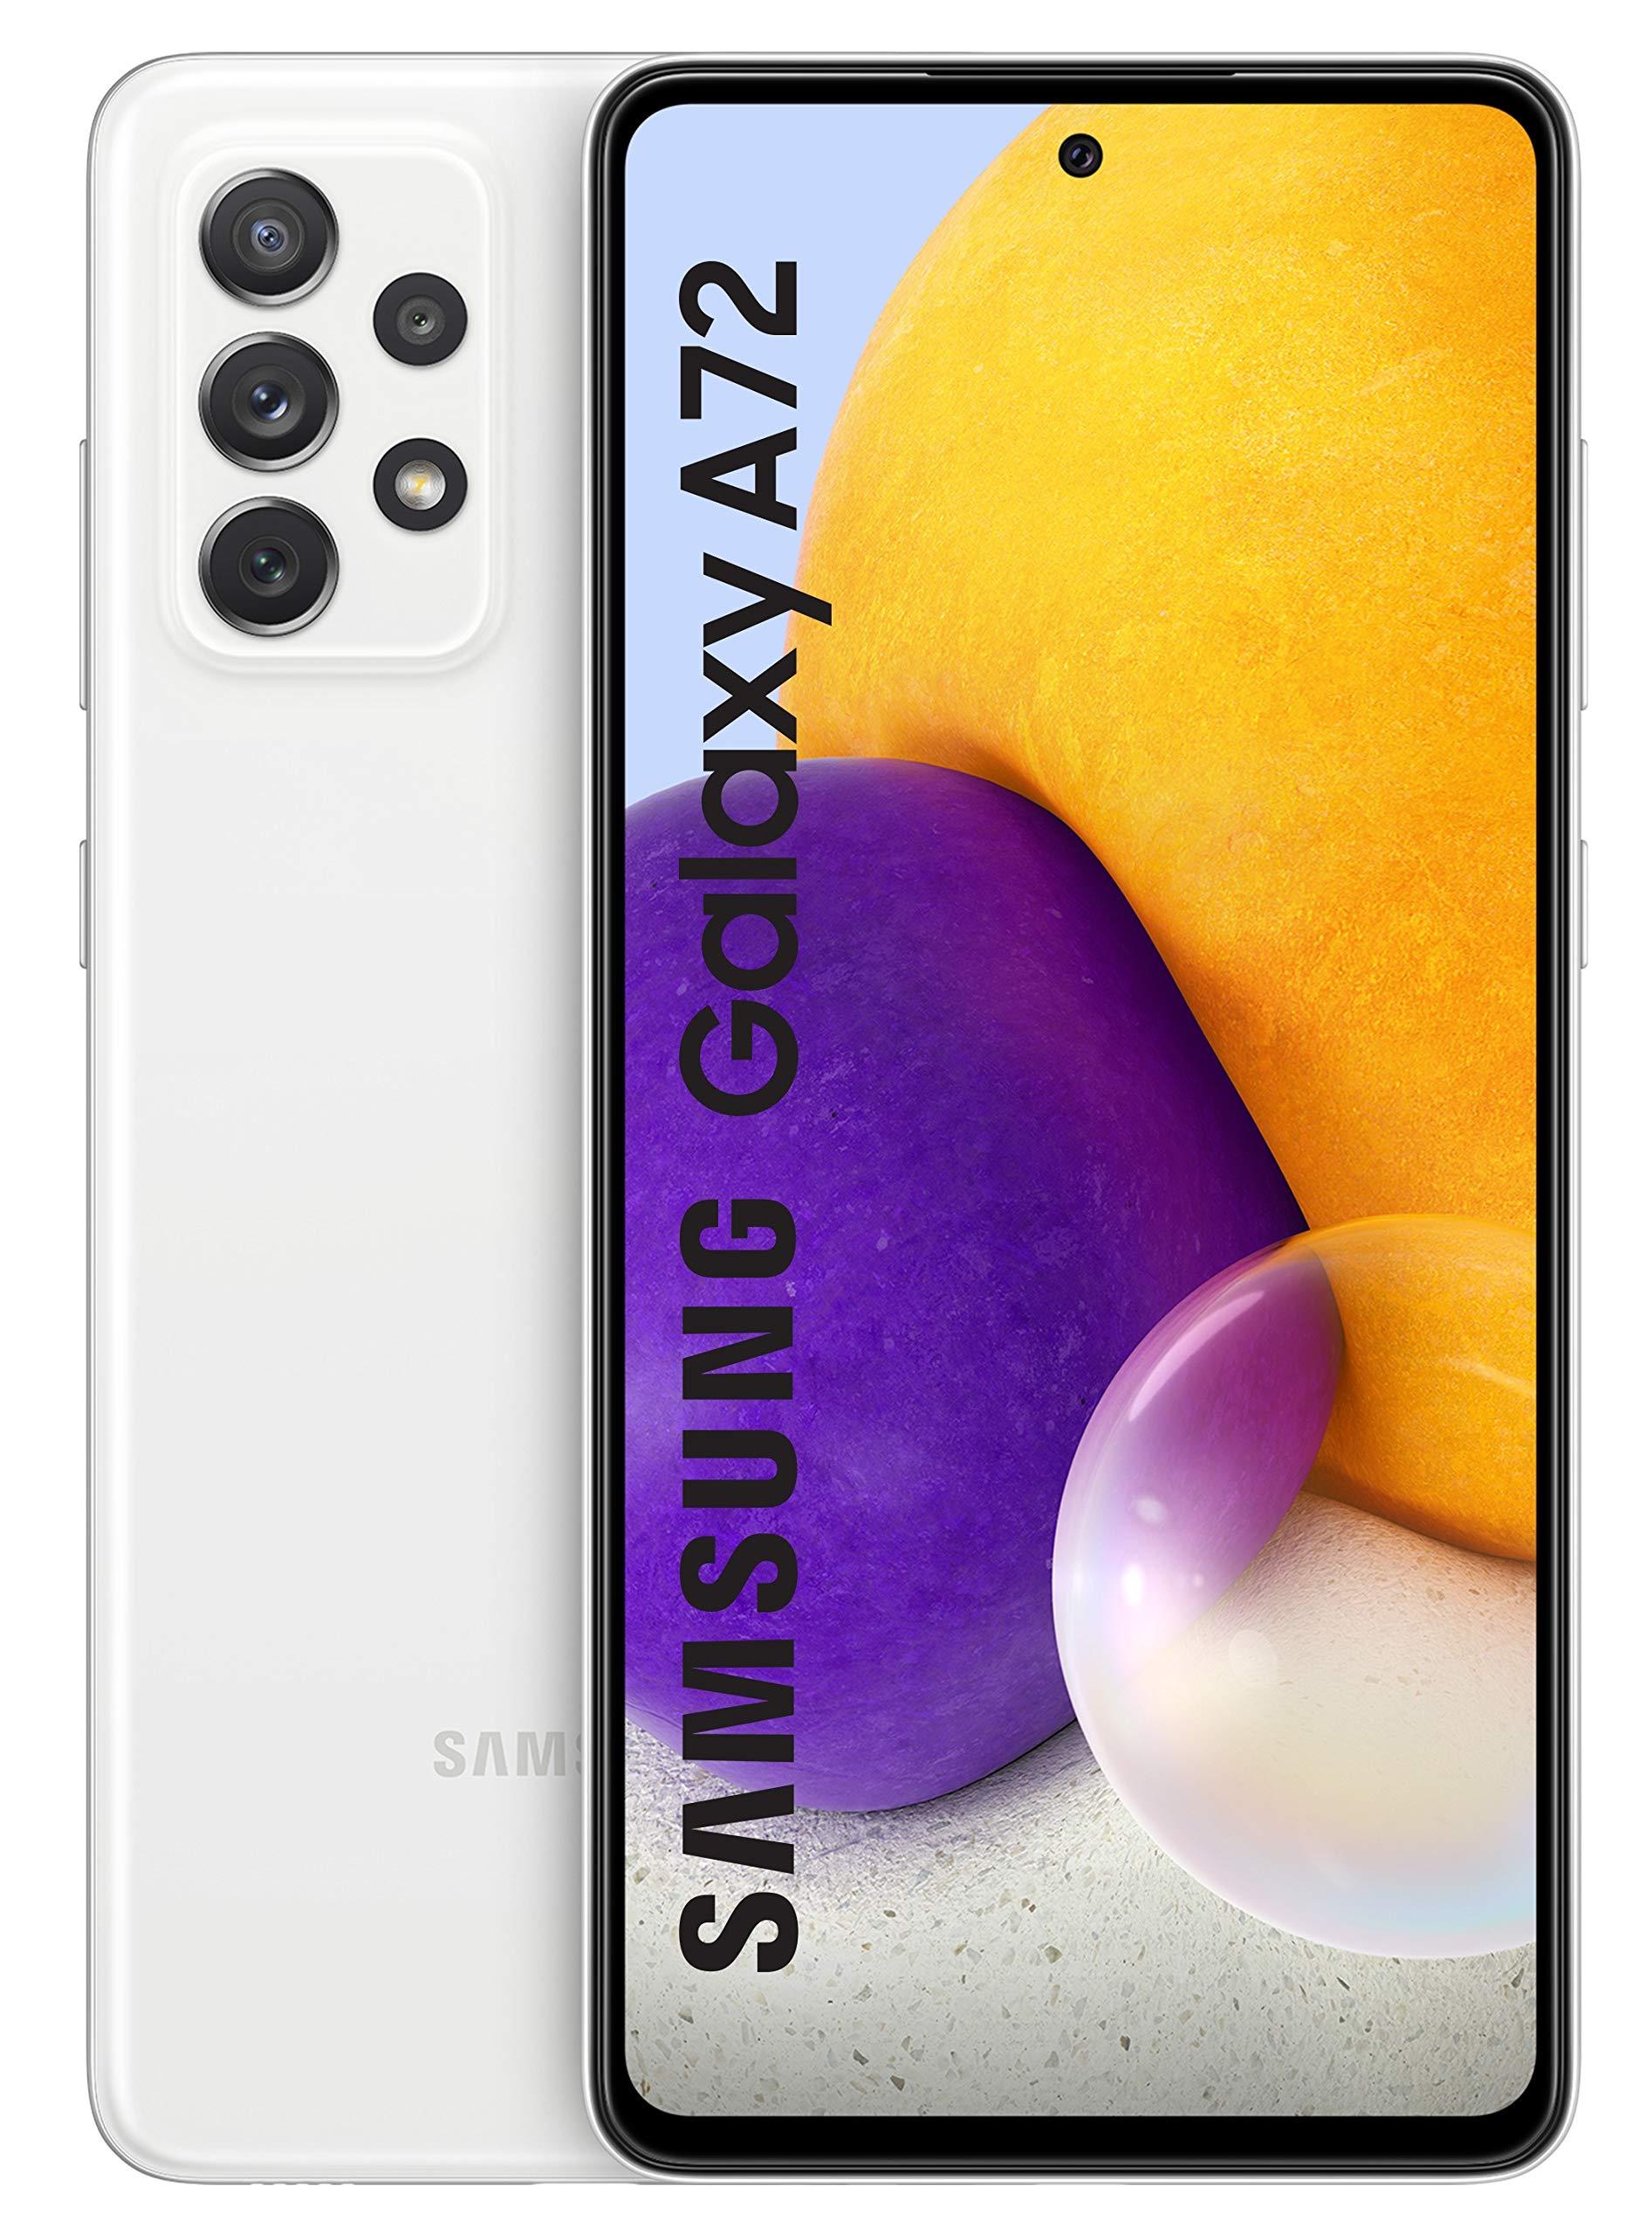 Samsung Galaxy A72 (White, 8GB RAM, 128GB Storage) with No Cost EMI/Additional Exchange Offers